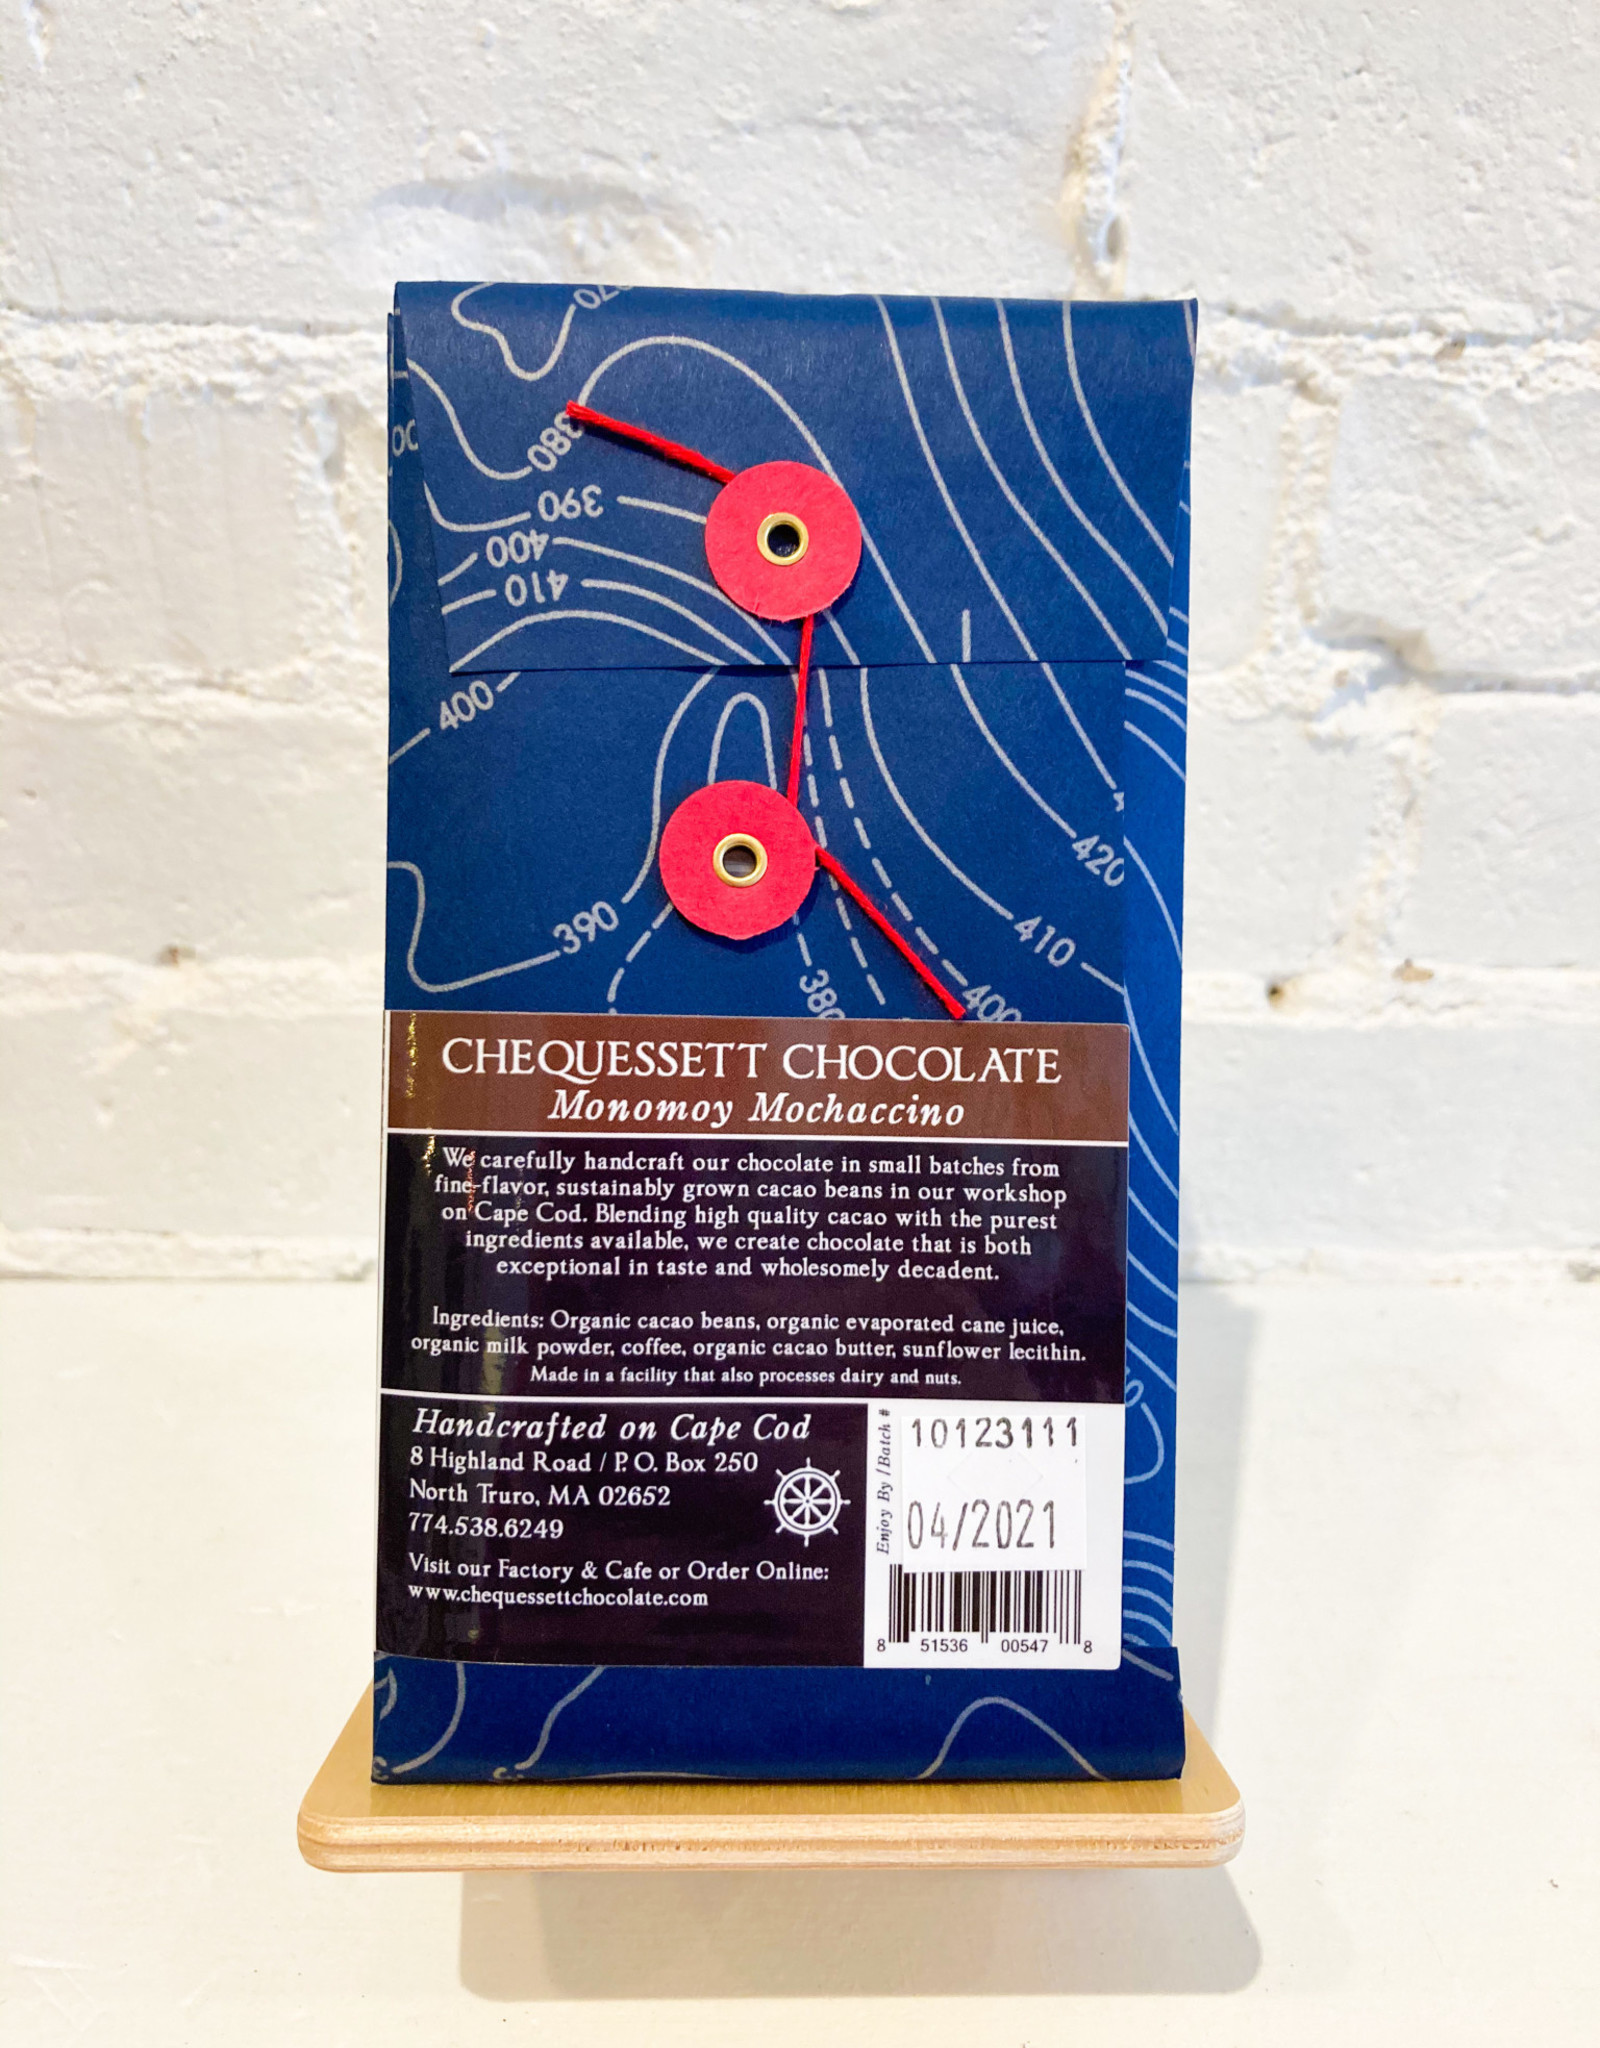 Chequessett Chocolate Monomoy Mochaccino Bar